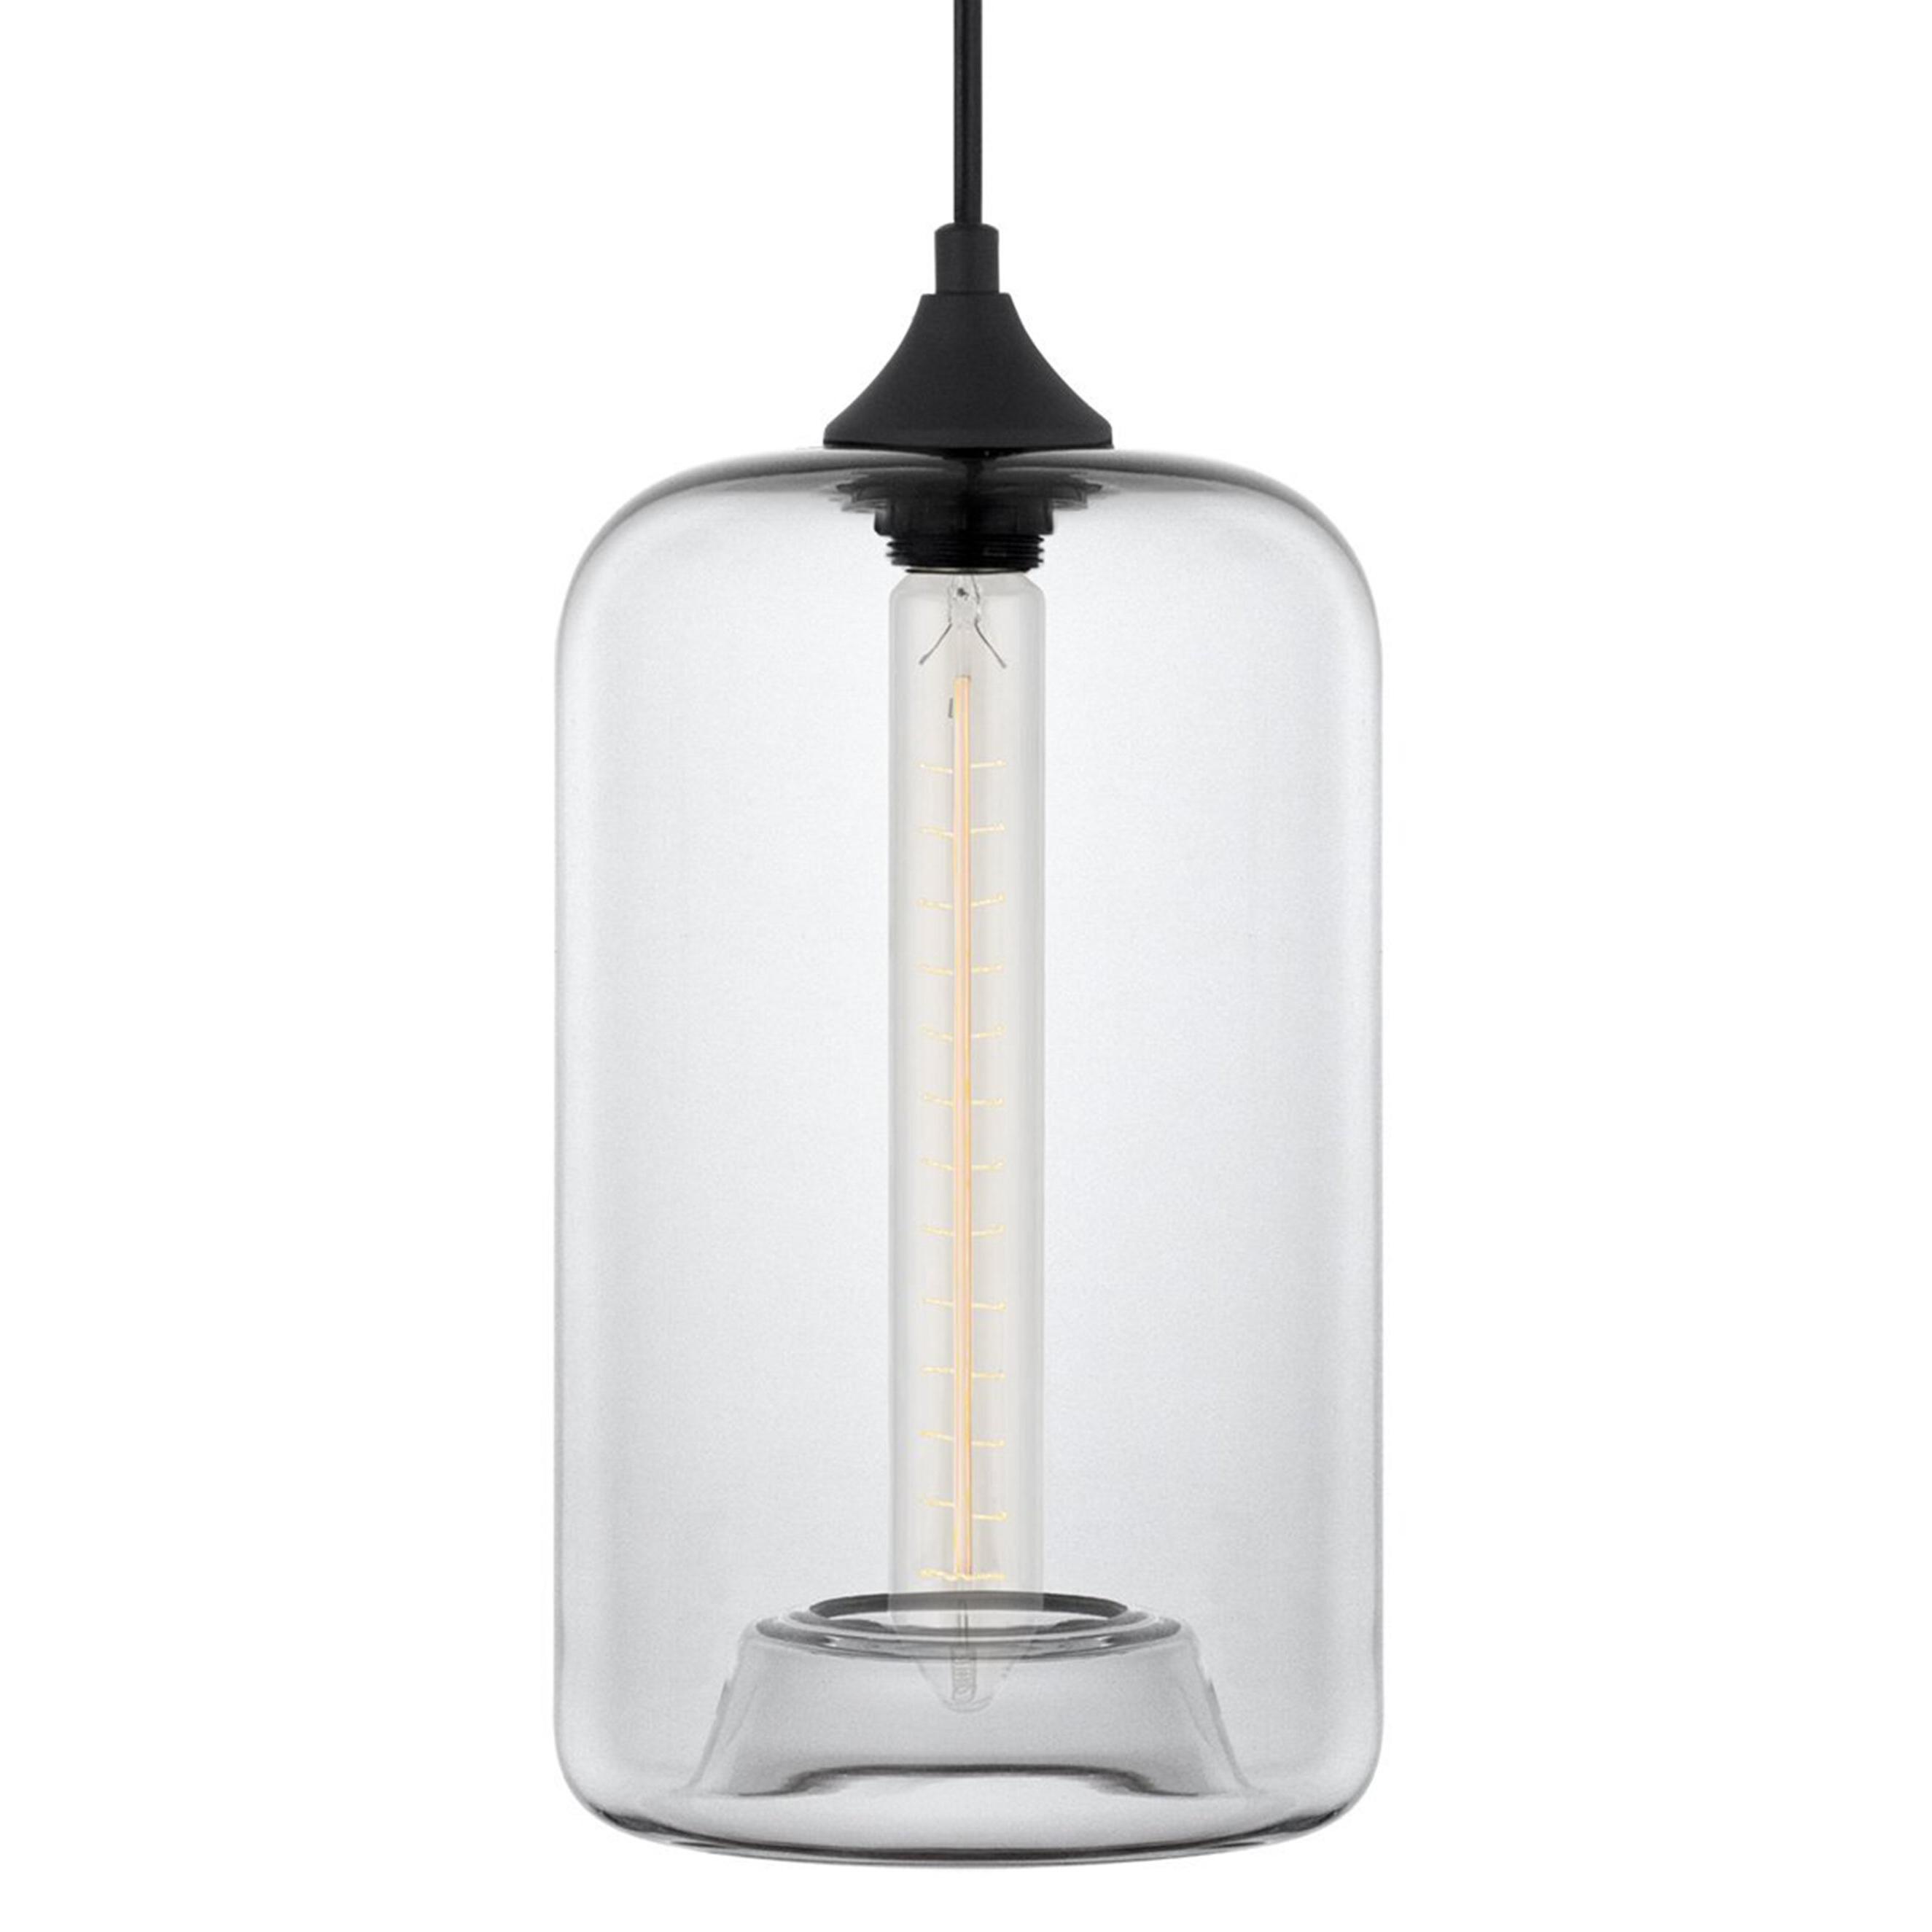 2019 Derek 1 Light Cylinder Pendant In Scruggs 1 Light Geometric Pendants (View 2 of 25)